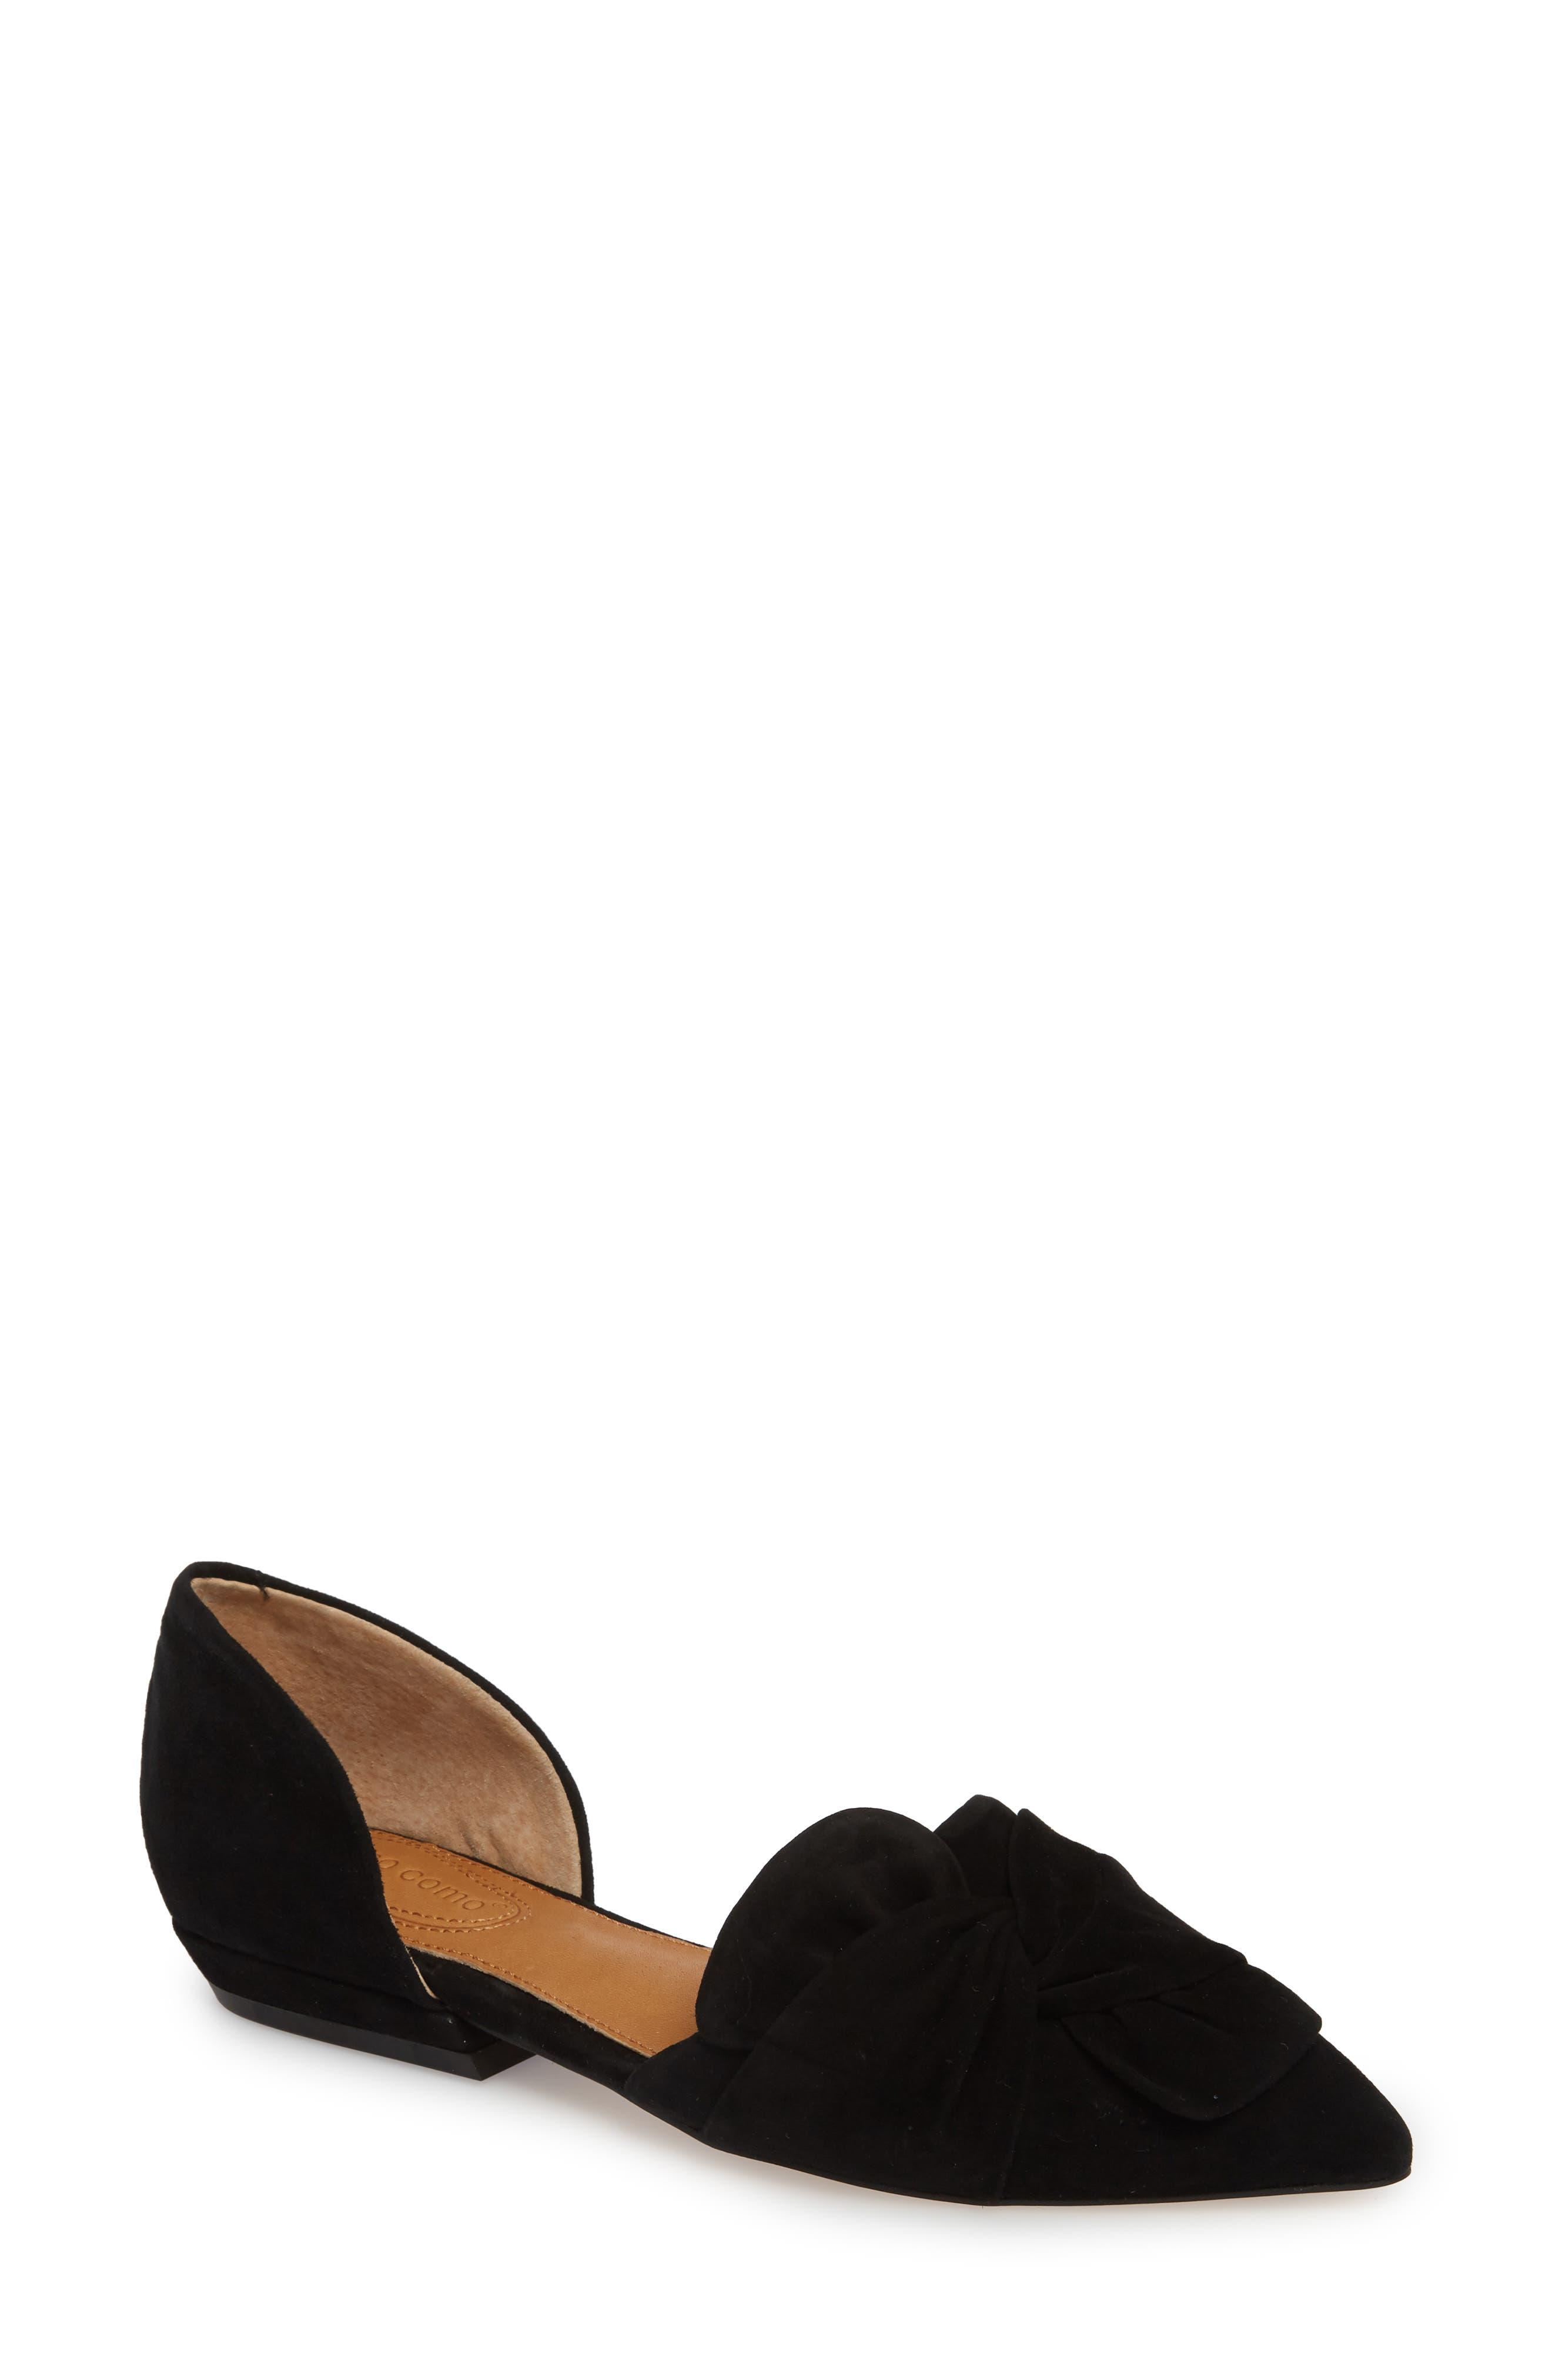 Mollie d'Orsay Flat,                             Main thumbnail 1, color,                             BLACK SUEDE